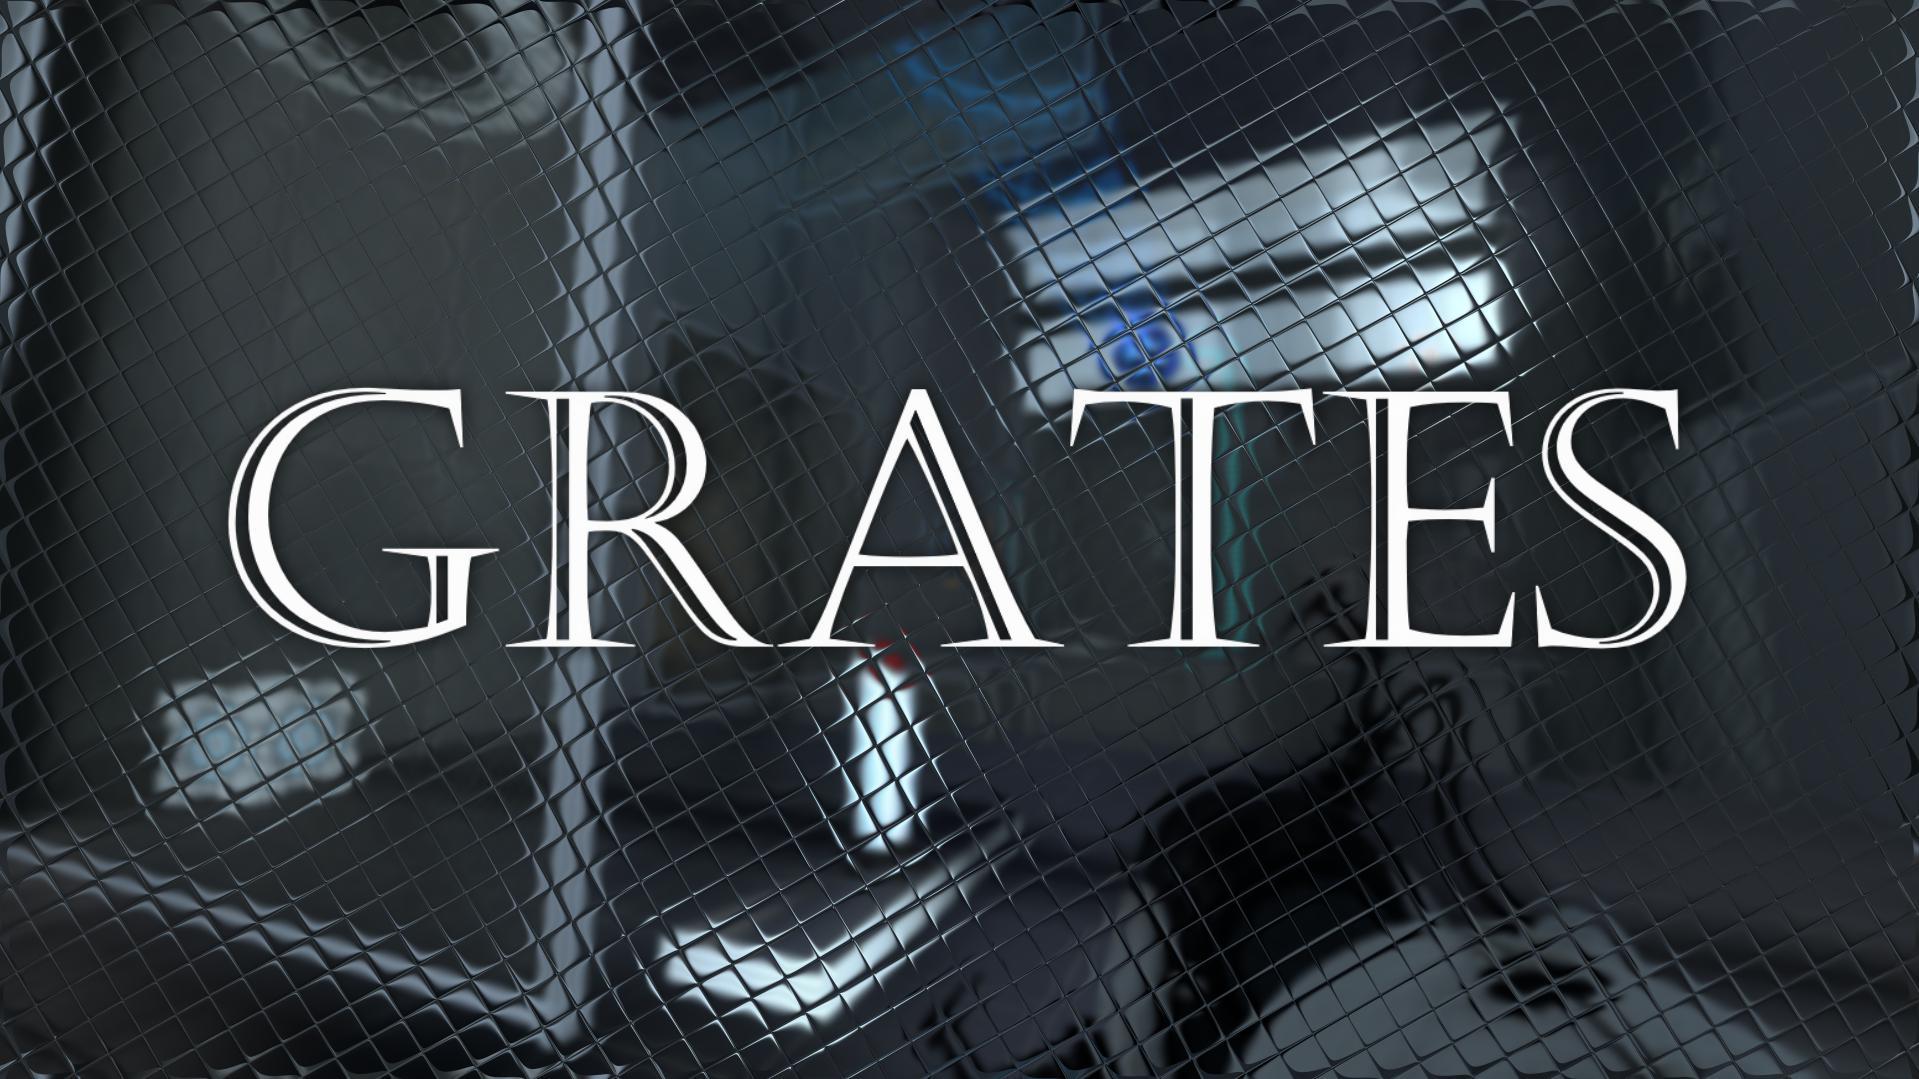 download grates